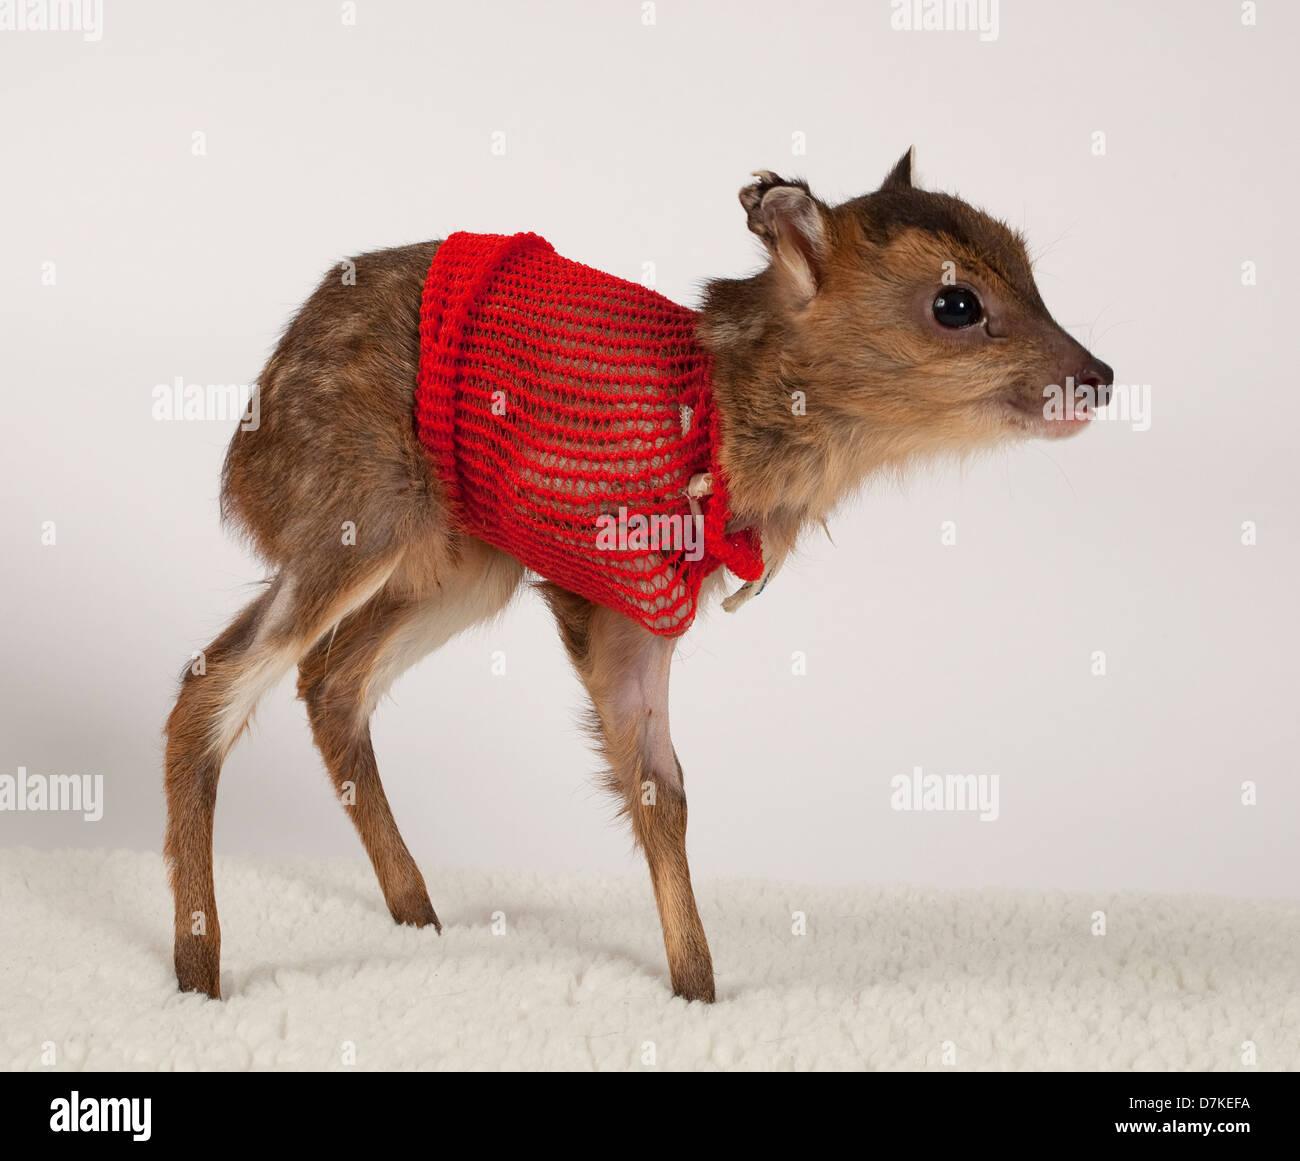 Juvenile Muntjac deer with bandage - Stock Image